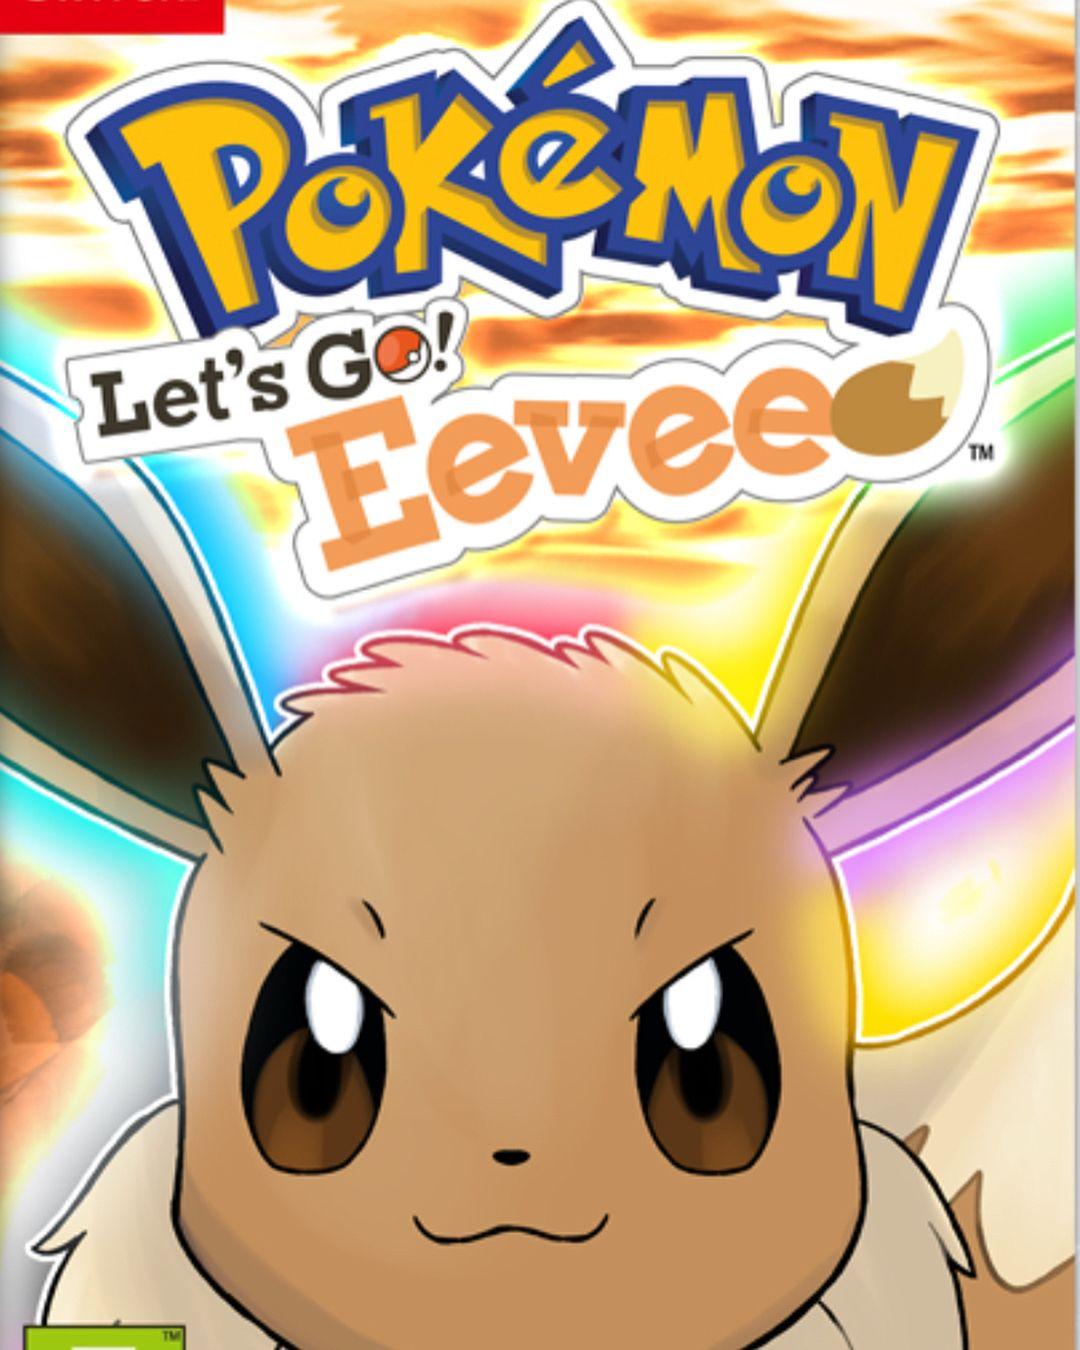 #pokemonletsgopikachu #pokemonletsgoeevee #pokemonswitch #pokemon #pikachu #eevee #nintendo #e3 #kanto